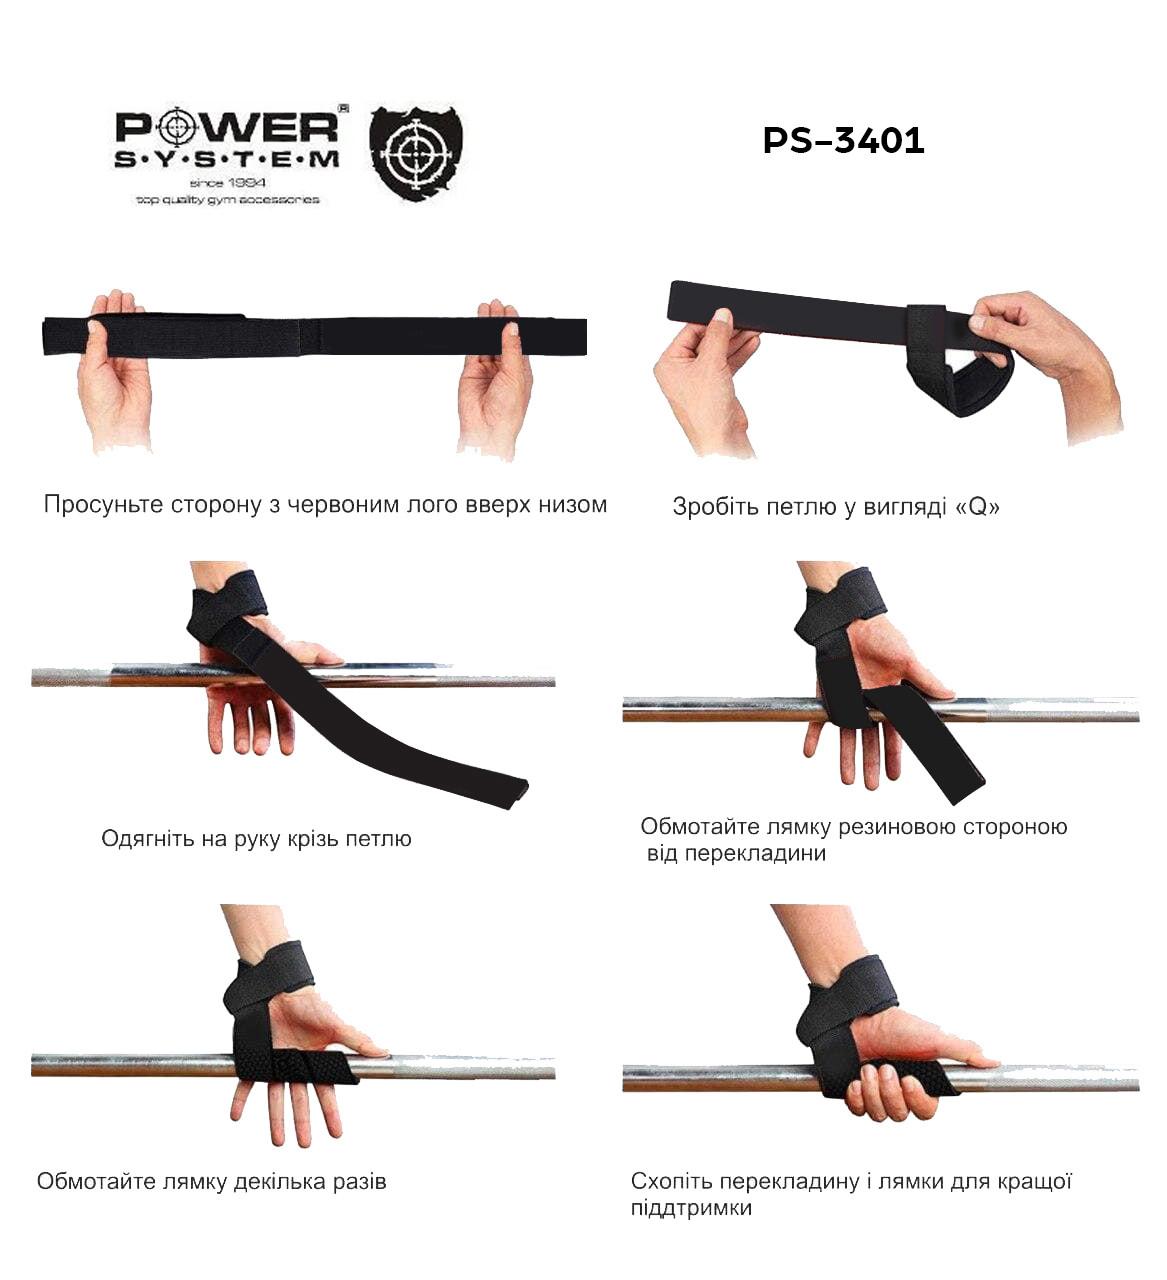 Кистевые ремни Power System PS-3401 Lifting Straps Duplex Black/Red